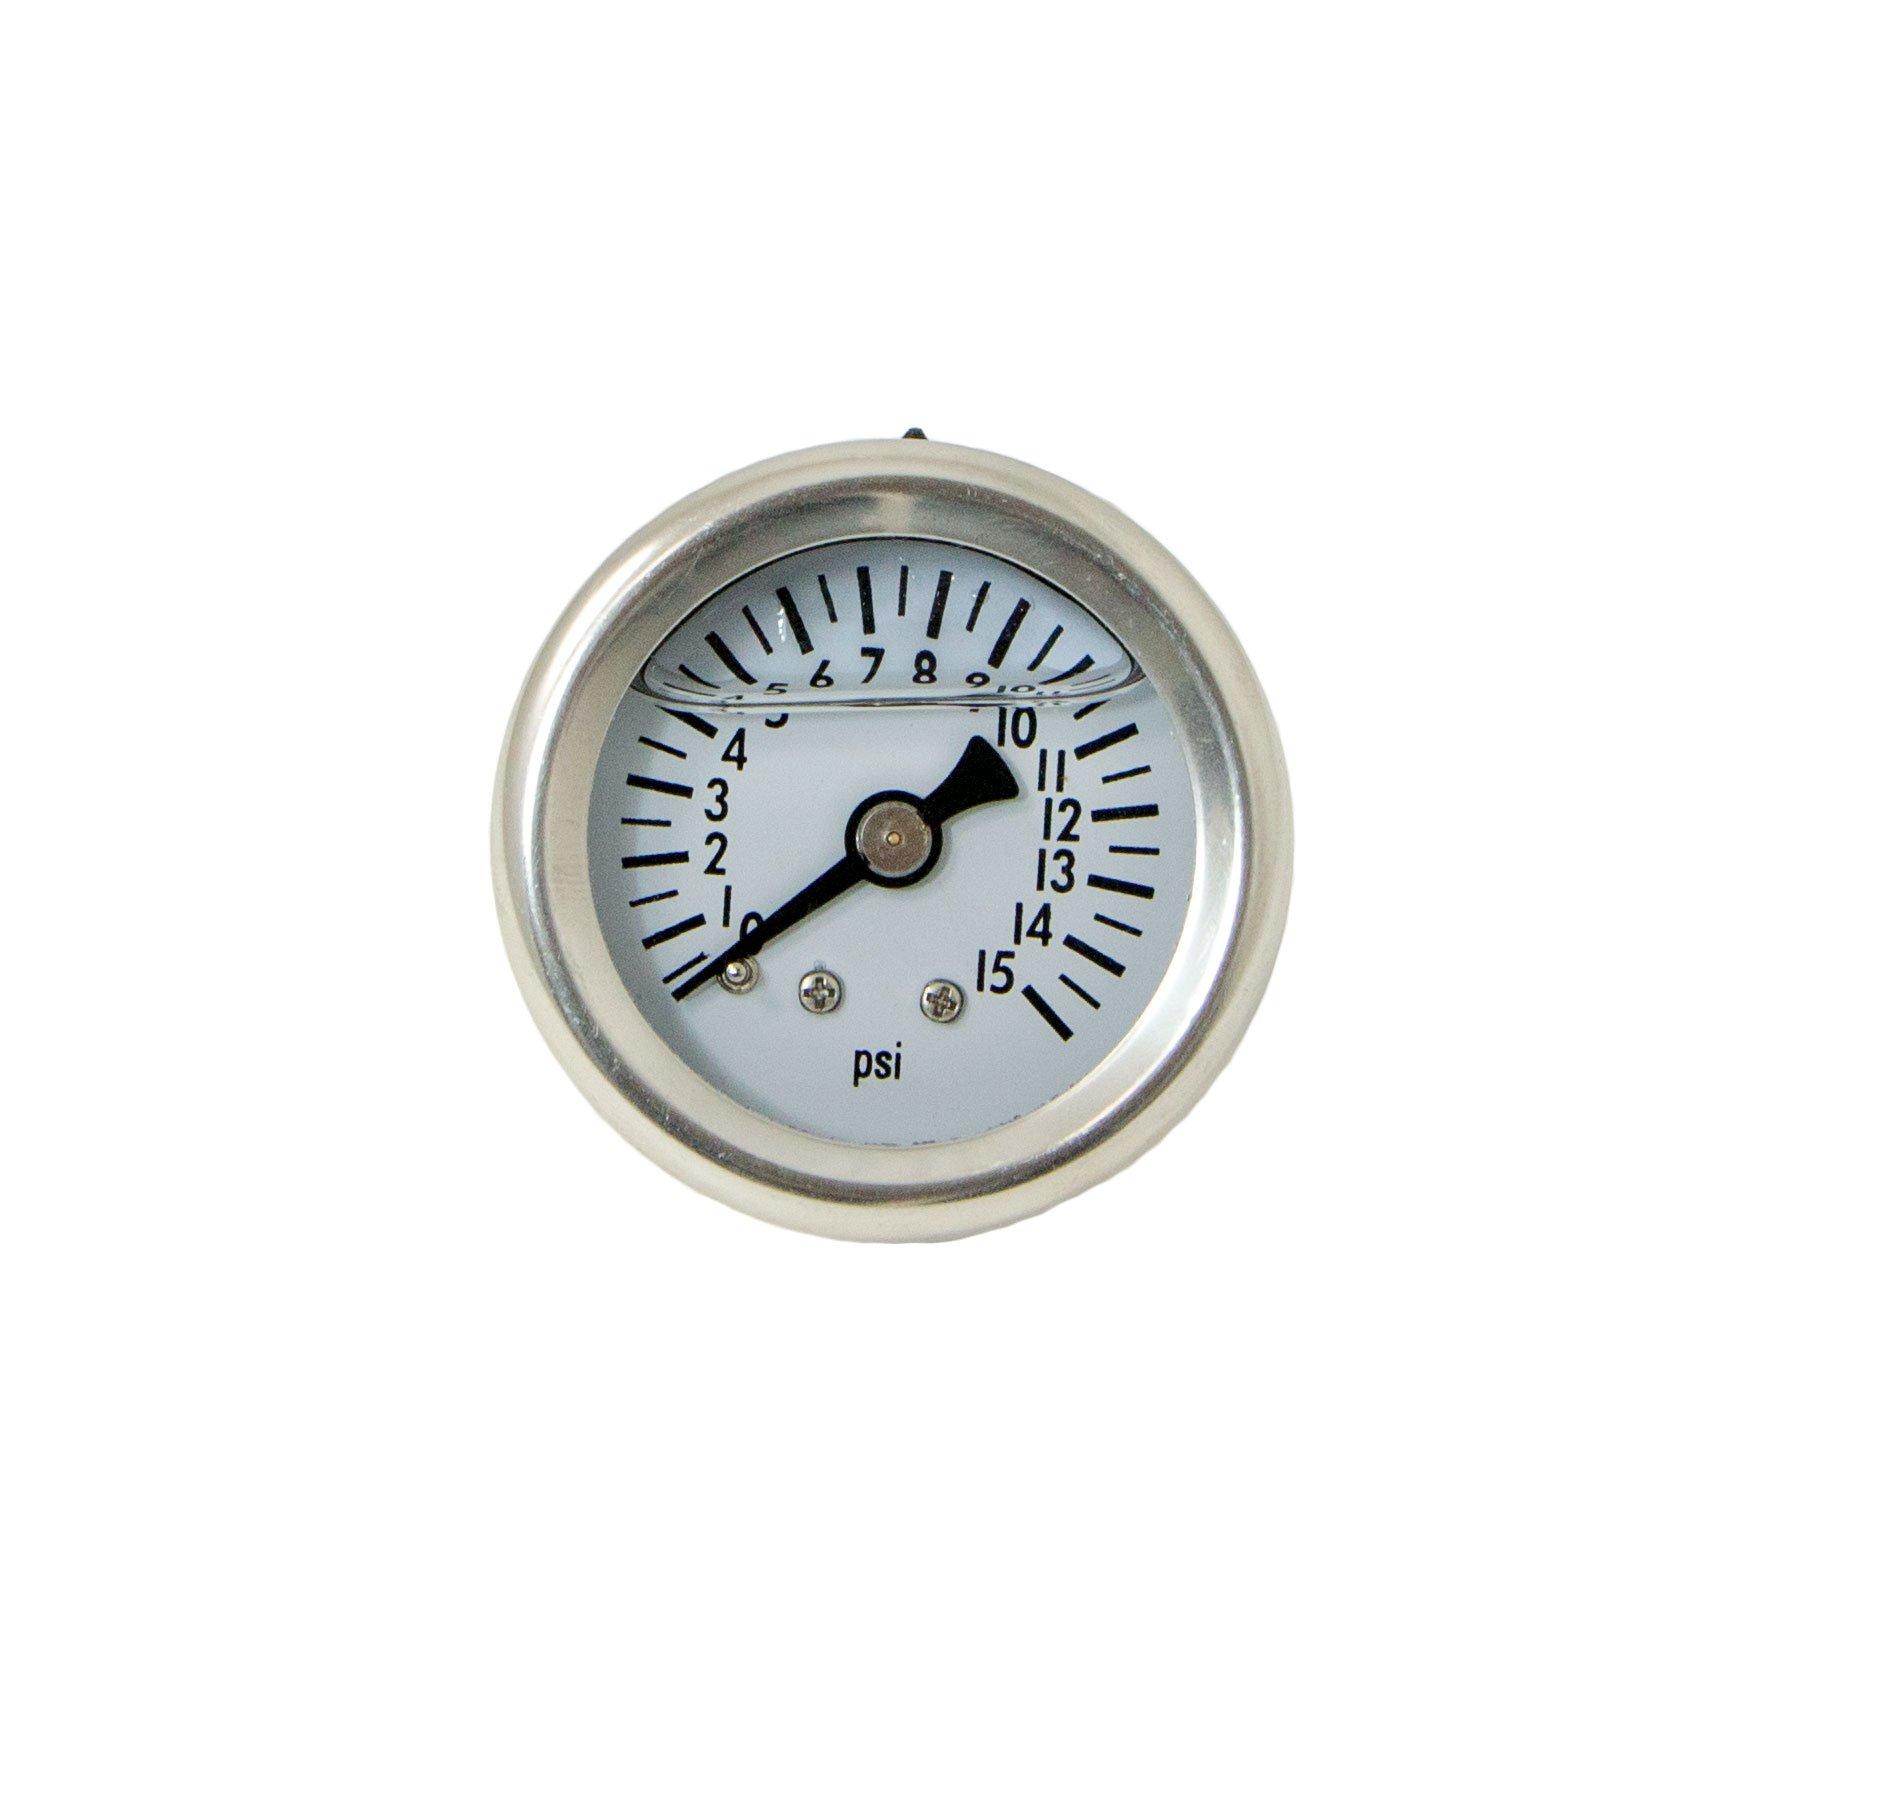 Top Street Performance JM1017 1/8'' NPT Liquid Filled Fuel Pressure Gauge (0-15 psi)